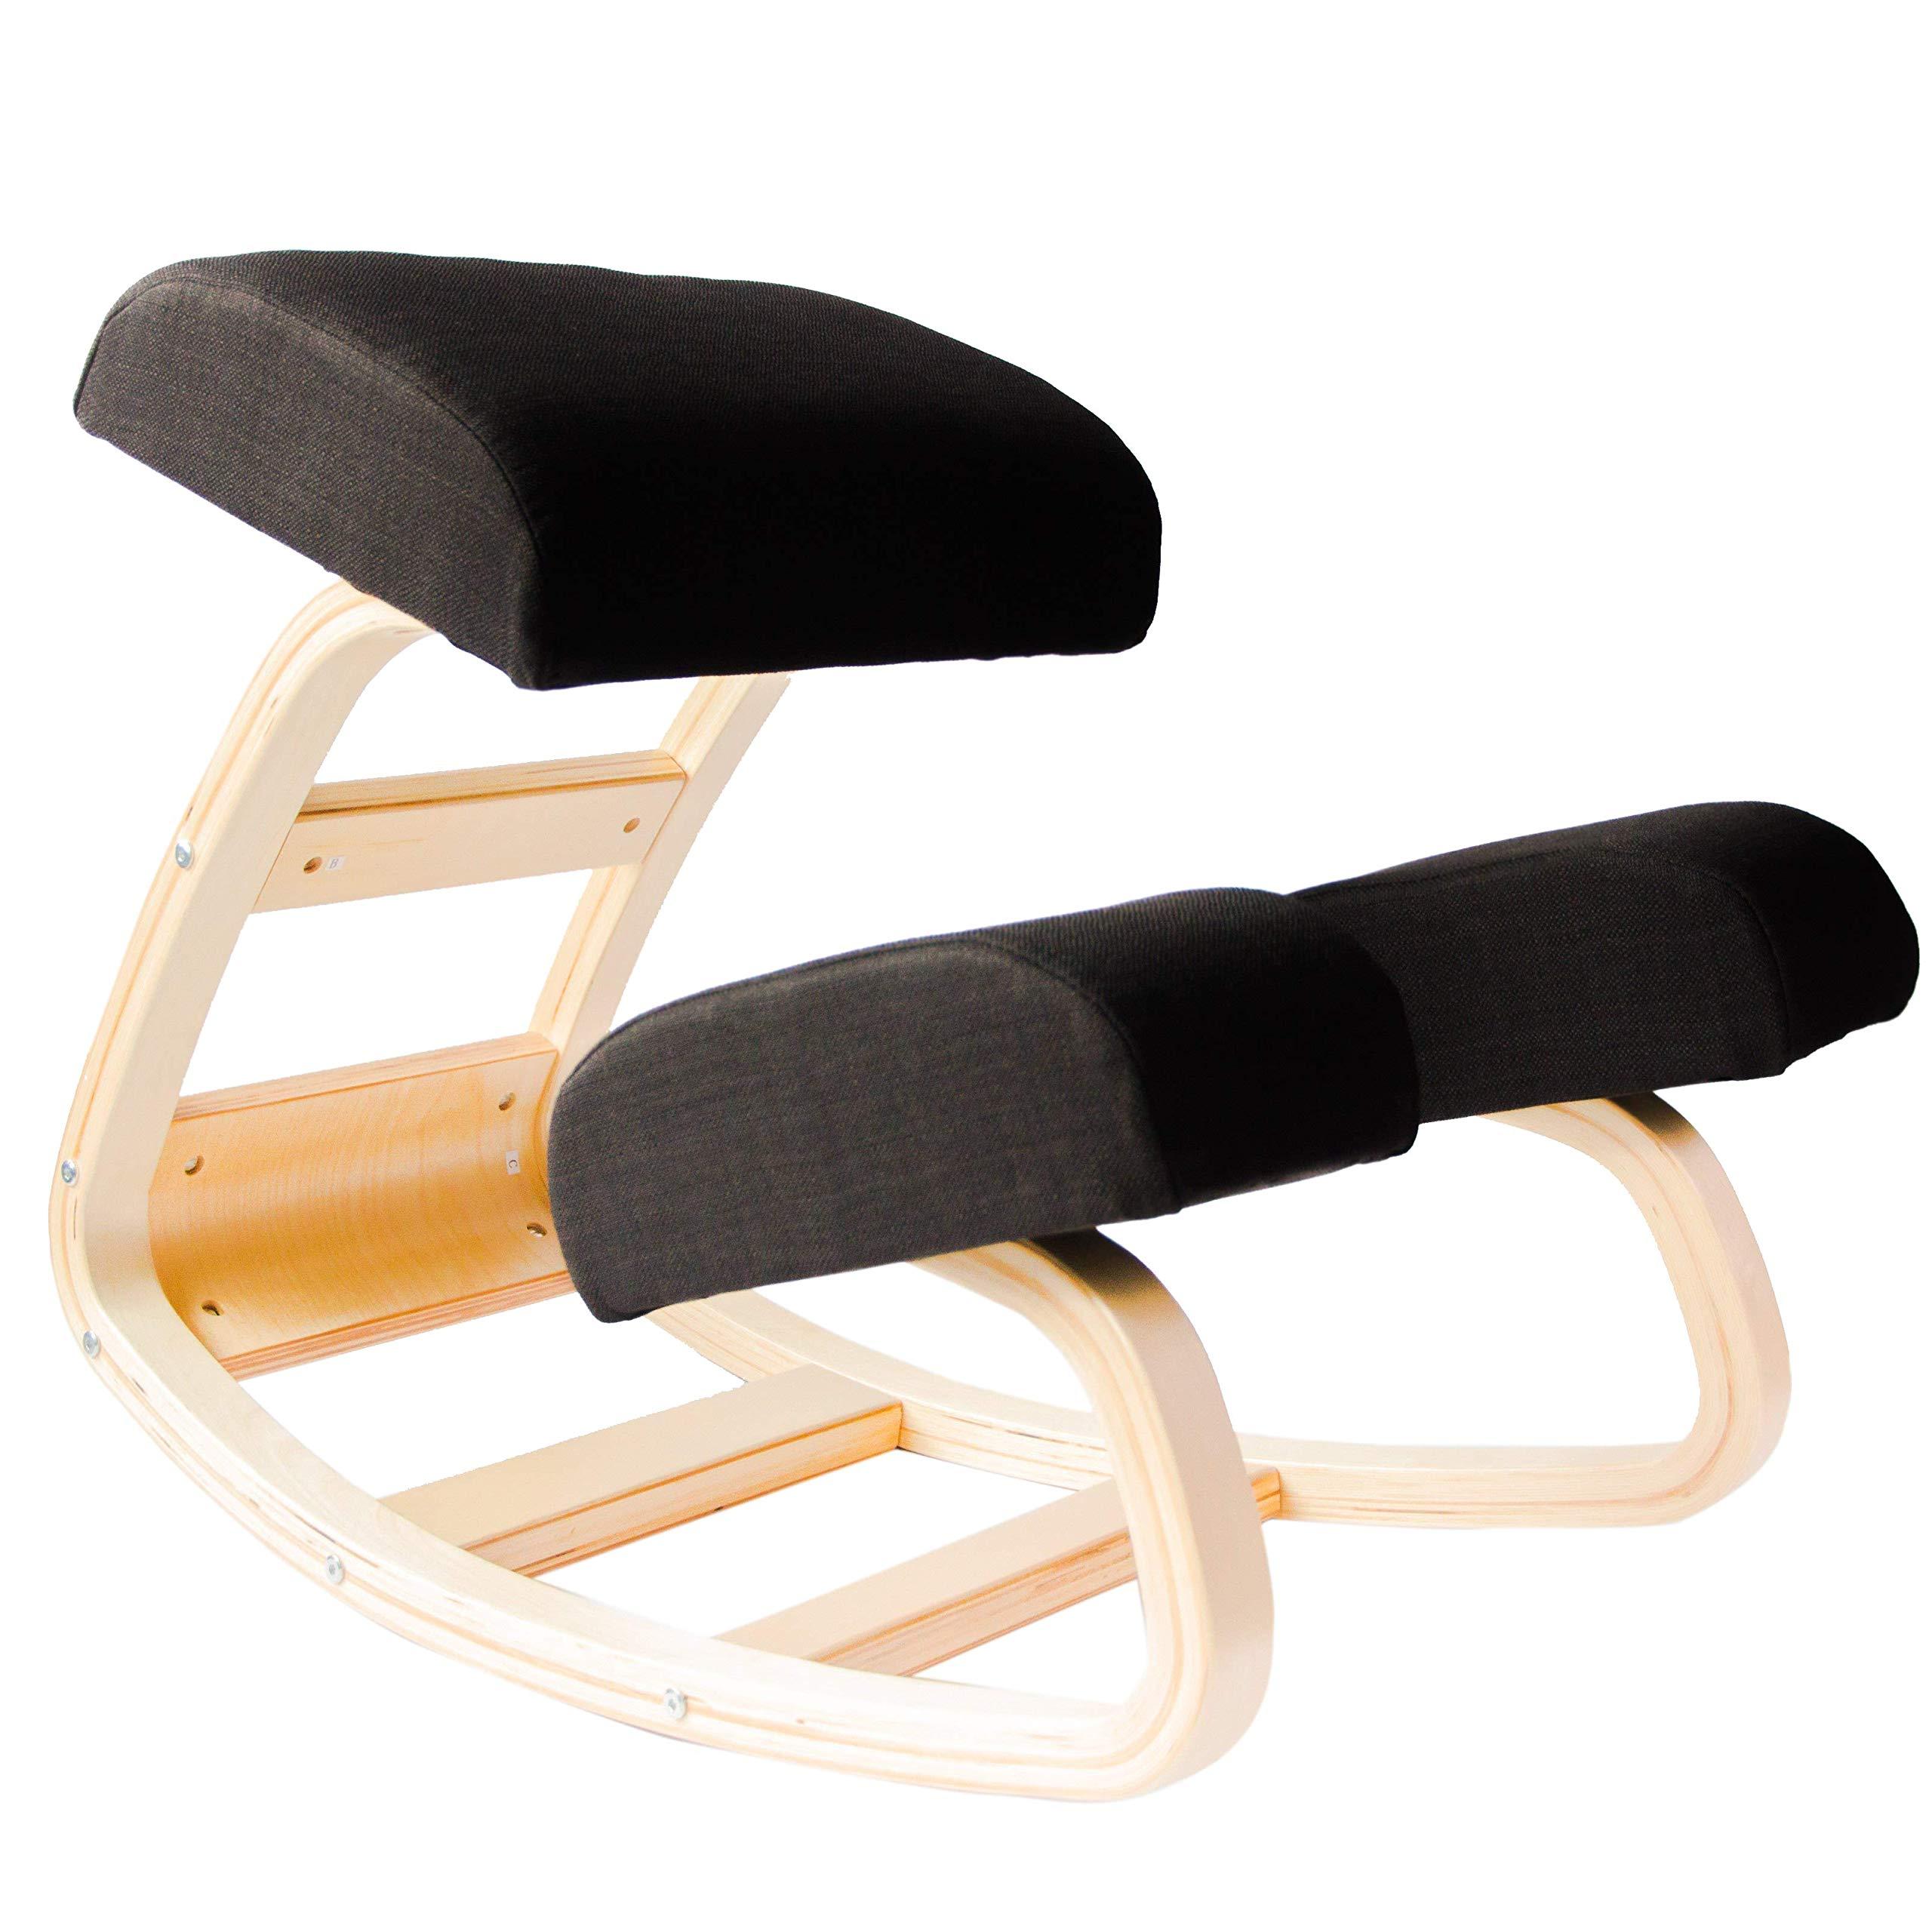 Sleekform Kneeling Chair | Rocking Ergonomic Wood Knee Stool for Office & Home | Posture Correcting for Bad Backs, Neck Pain, Spine Tension Relief | Orthopedic Balance Seat & Thick Knees Cushions by Sleekform